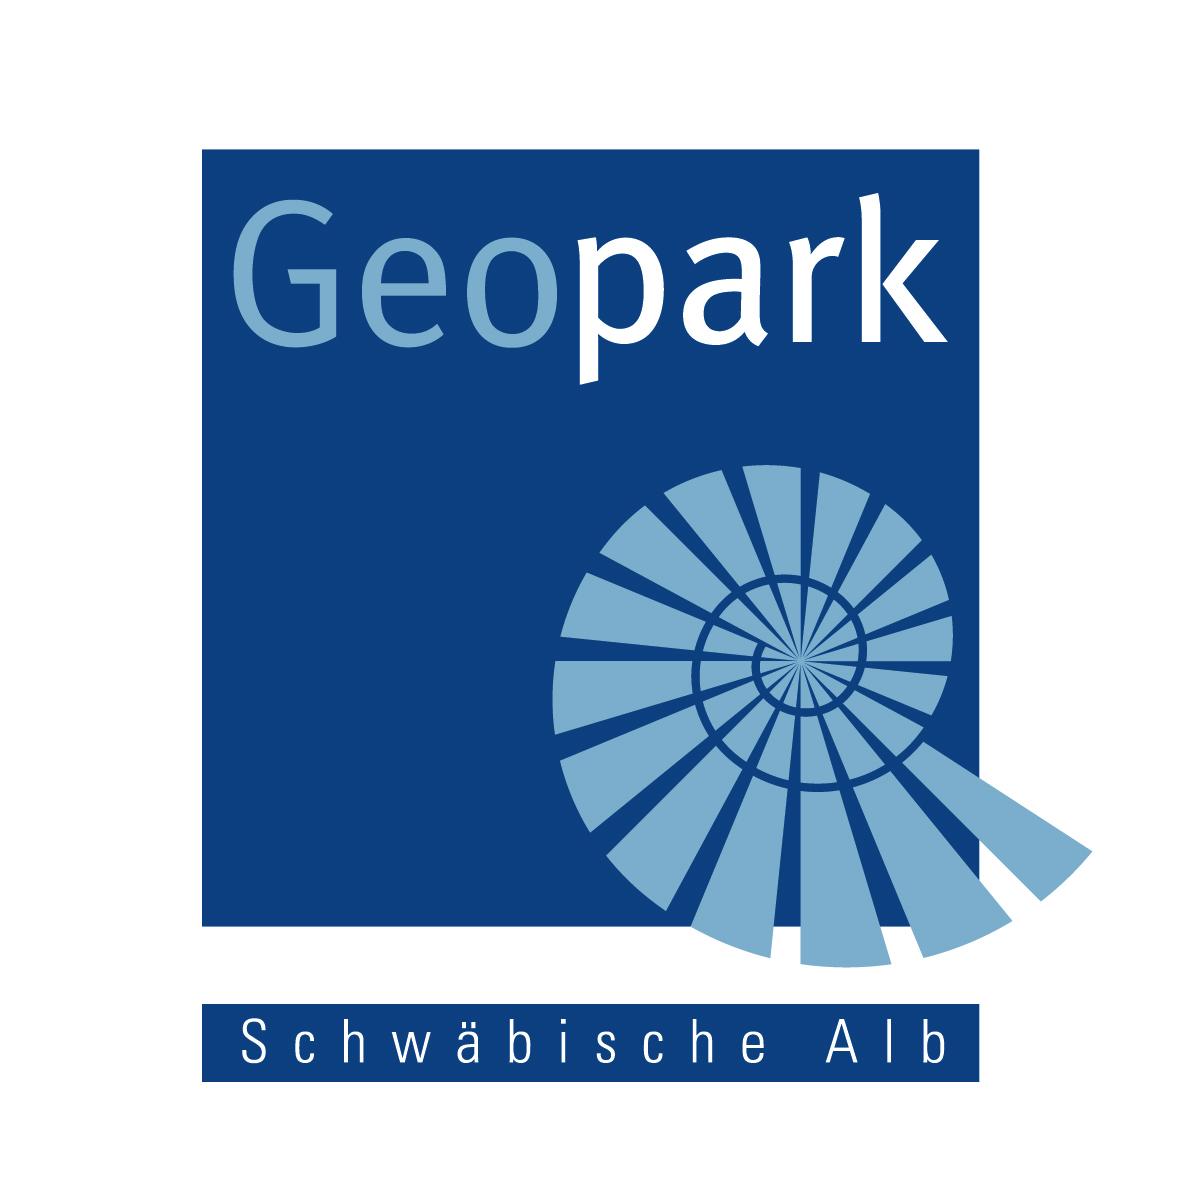 Geopark logo cmyk 2015